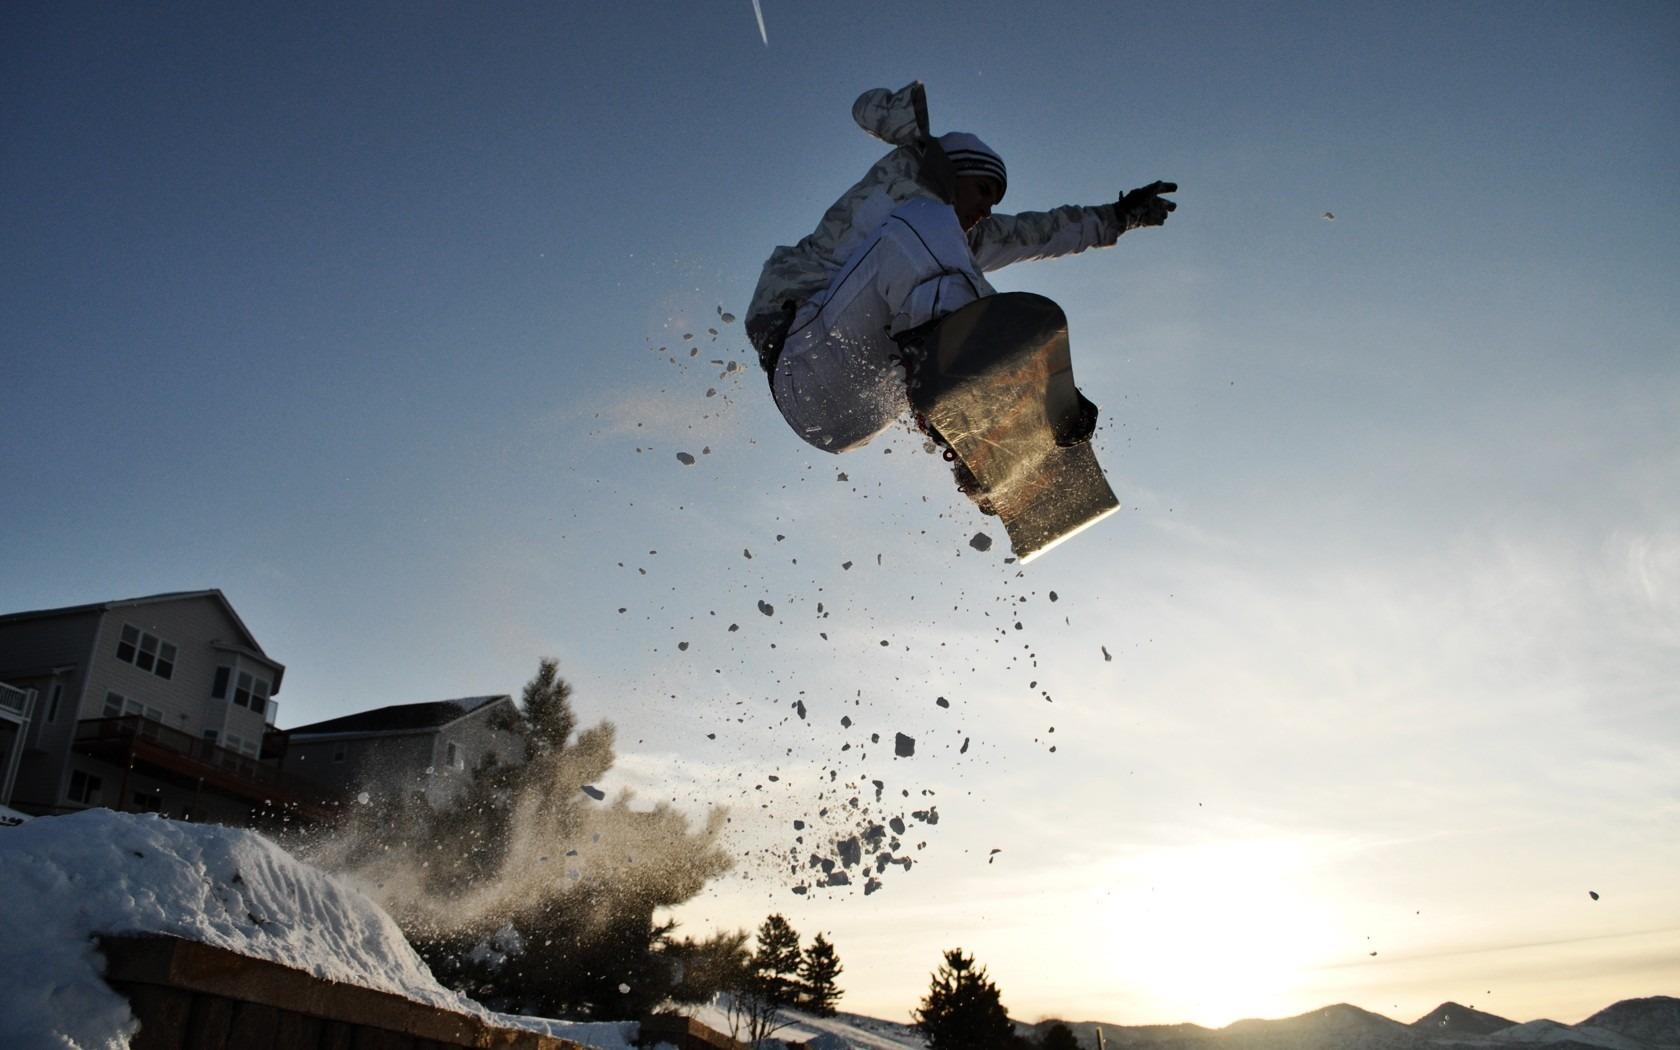 Wallpaper Men Jumping Snowboarding Snowboard